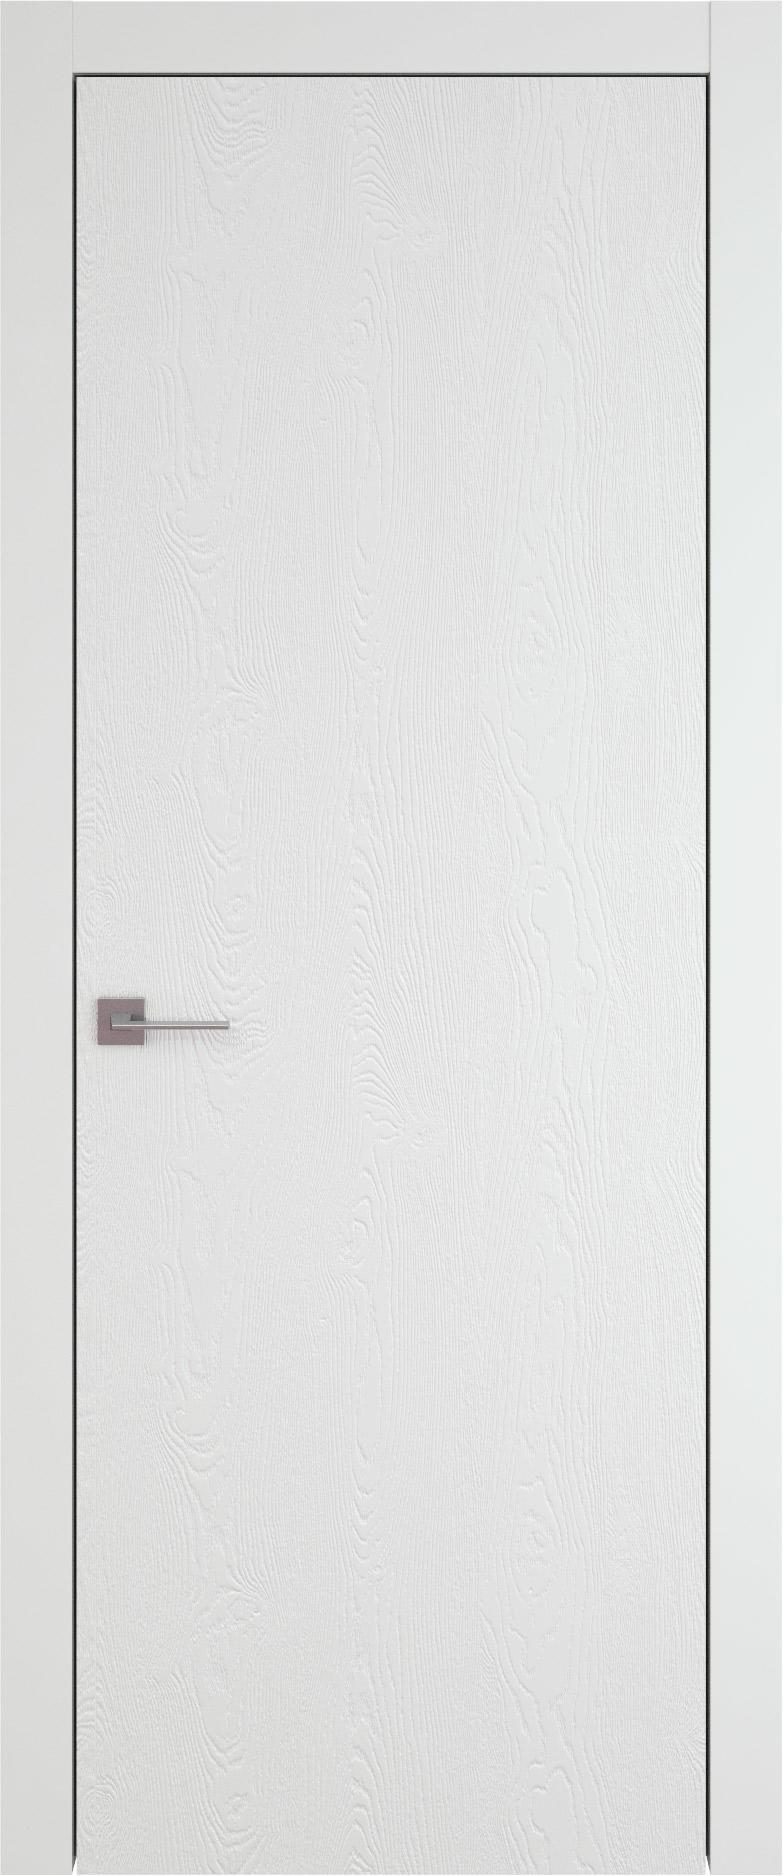 Tivoli А-1 цвет - Белая эмаль по шпону (RAL 9003) Без стекла (ДГ)